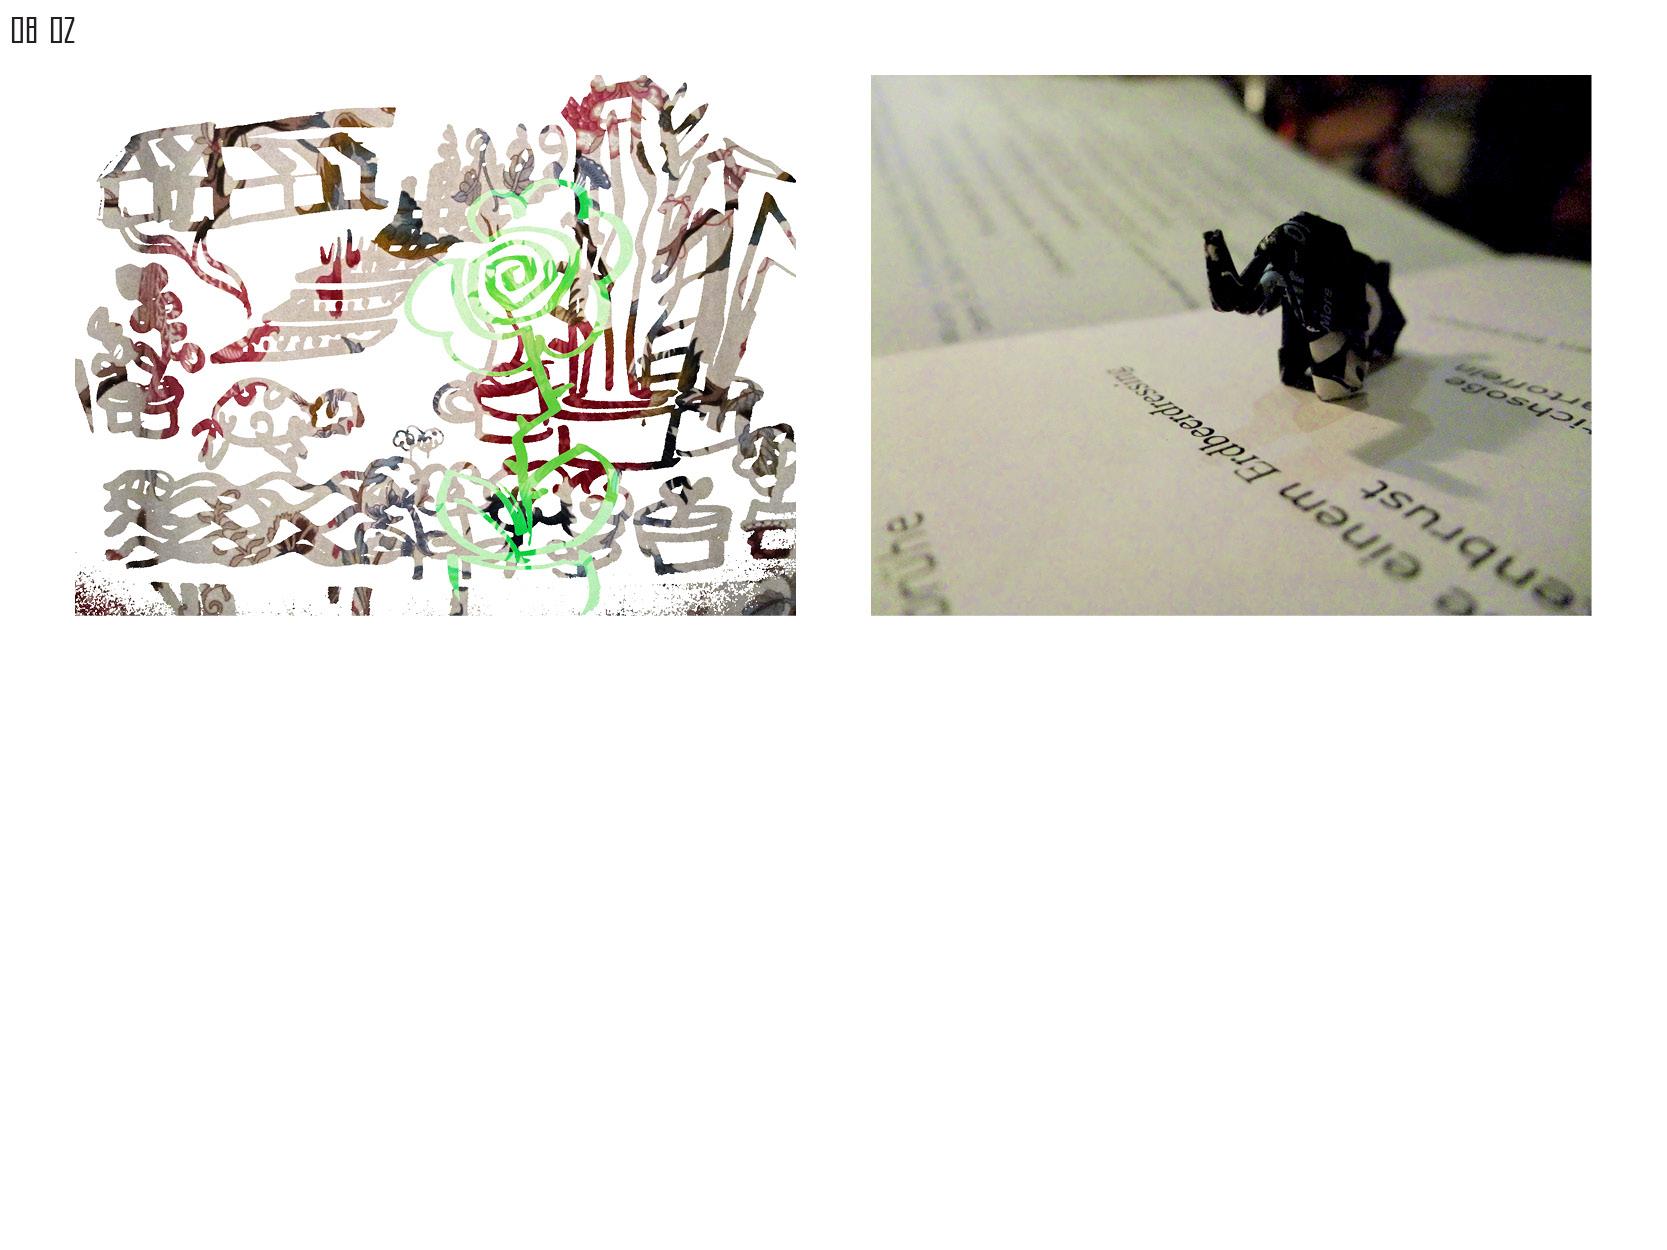 Gerrit-Schweiger-Dialog-Städte-Paris-Berlin-Jessica-Blank-Experiment-Fotoserie-Tagebuch-visuelle-Kommunikation-99